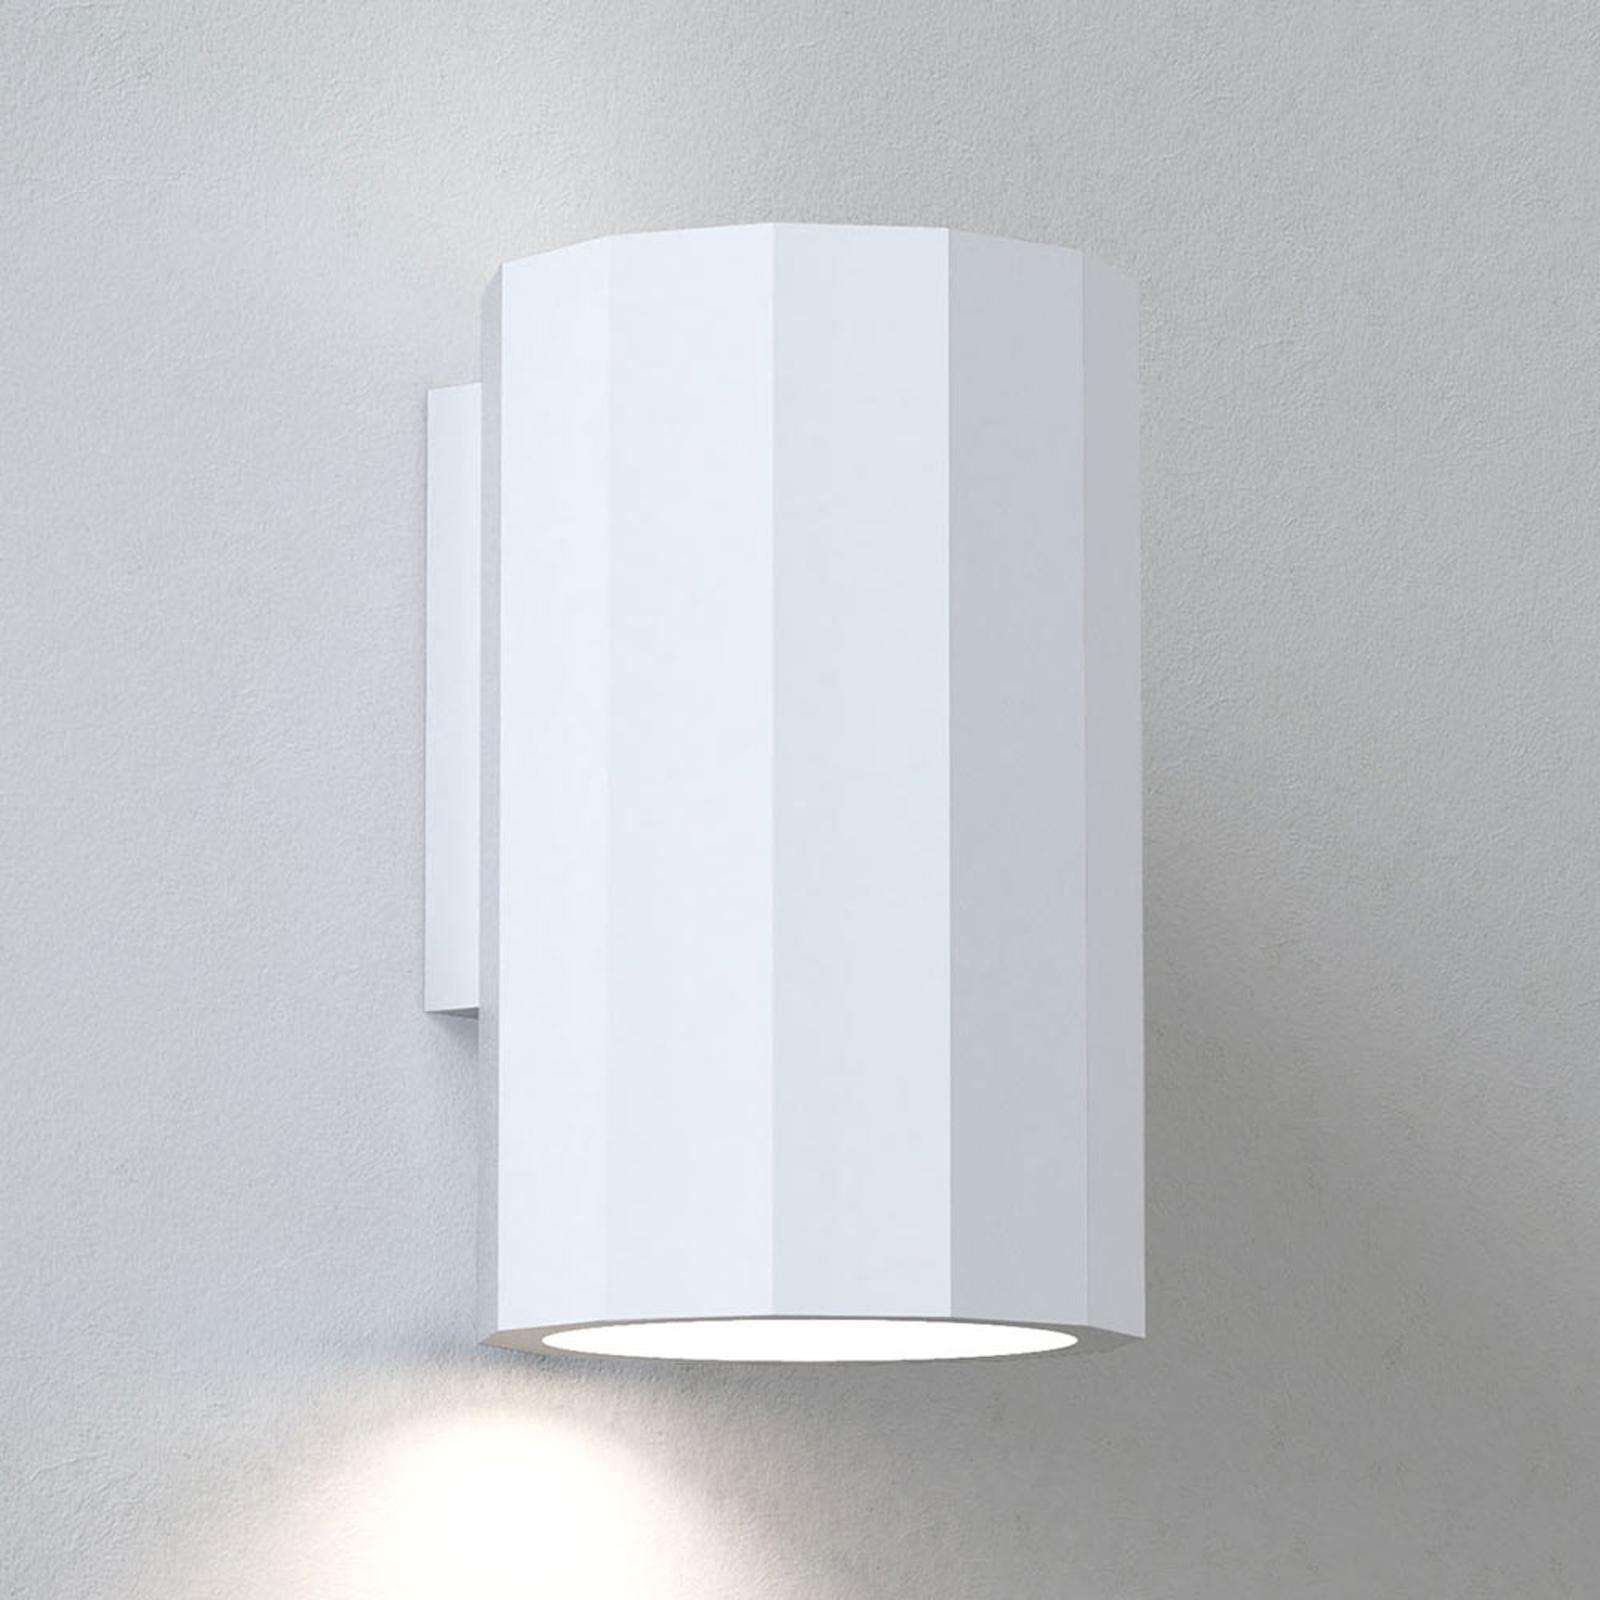 Astro Shadow 150 wandlamp van gips, 1-lamp